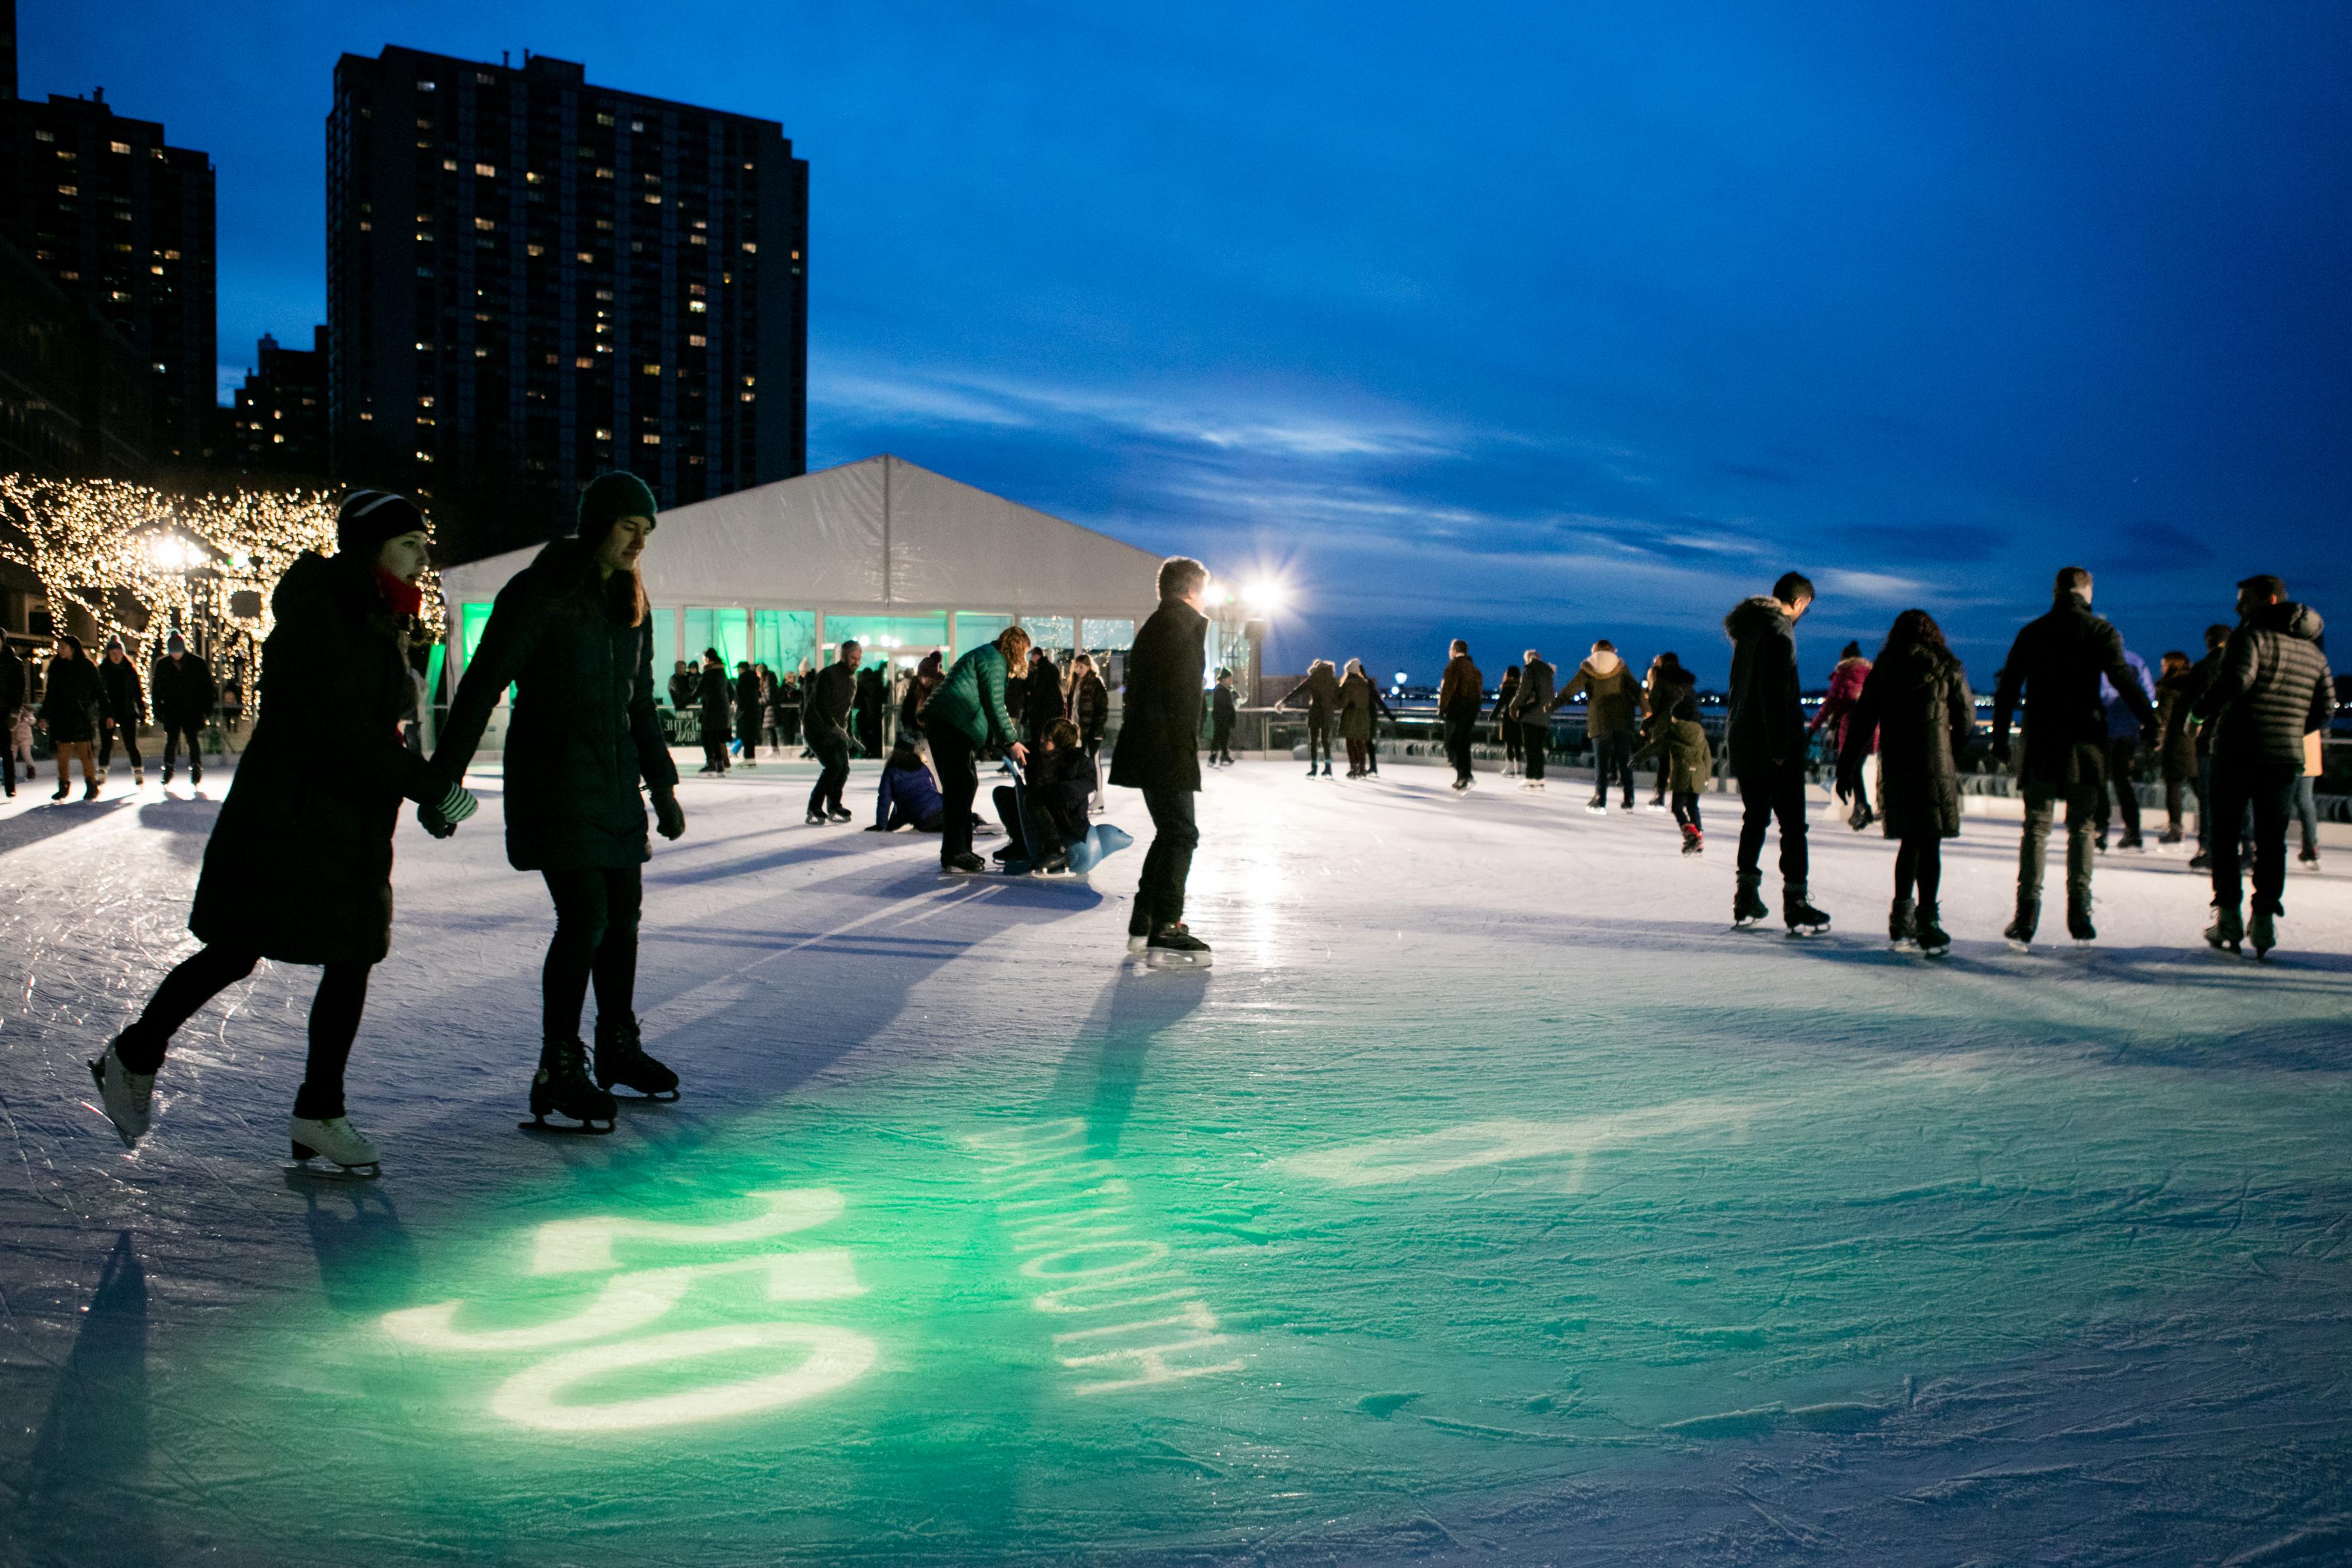 Dartmouth alumni and friends skate under a green-lit skyline